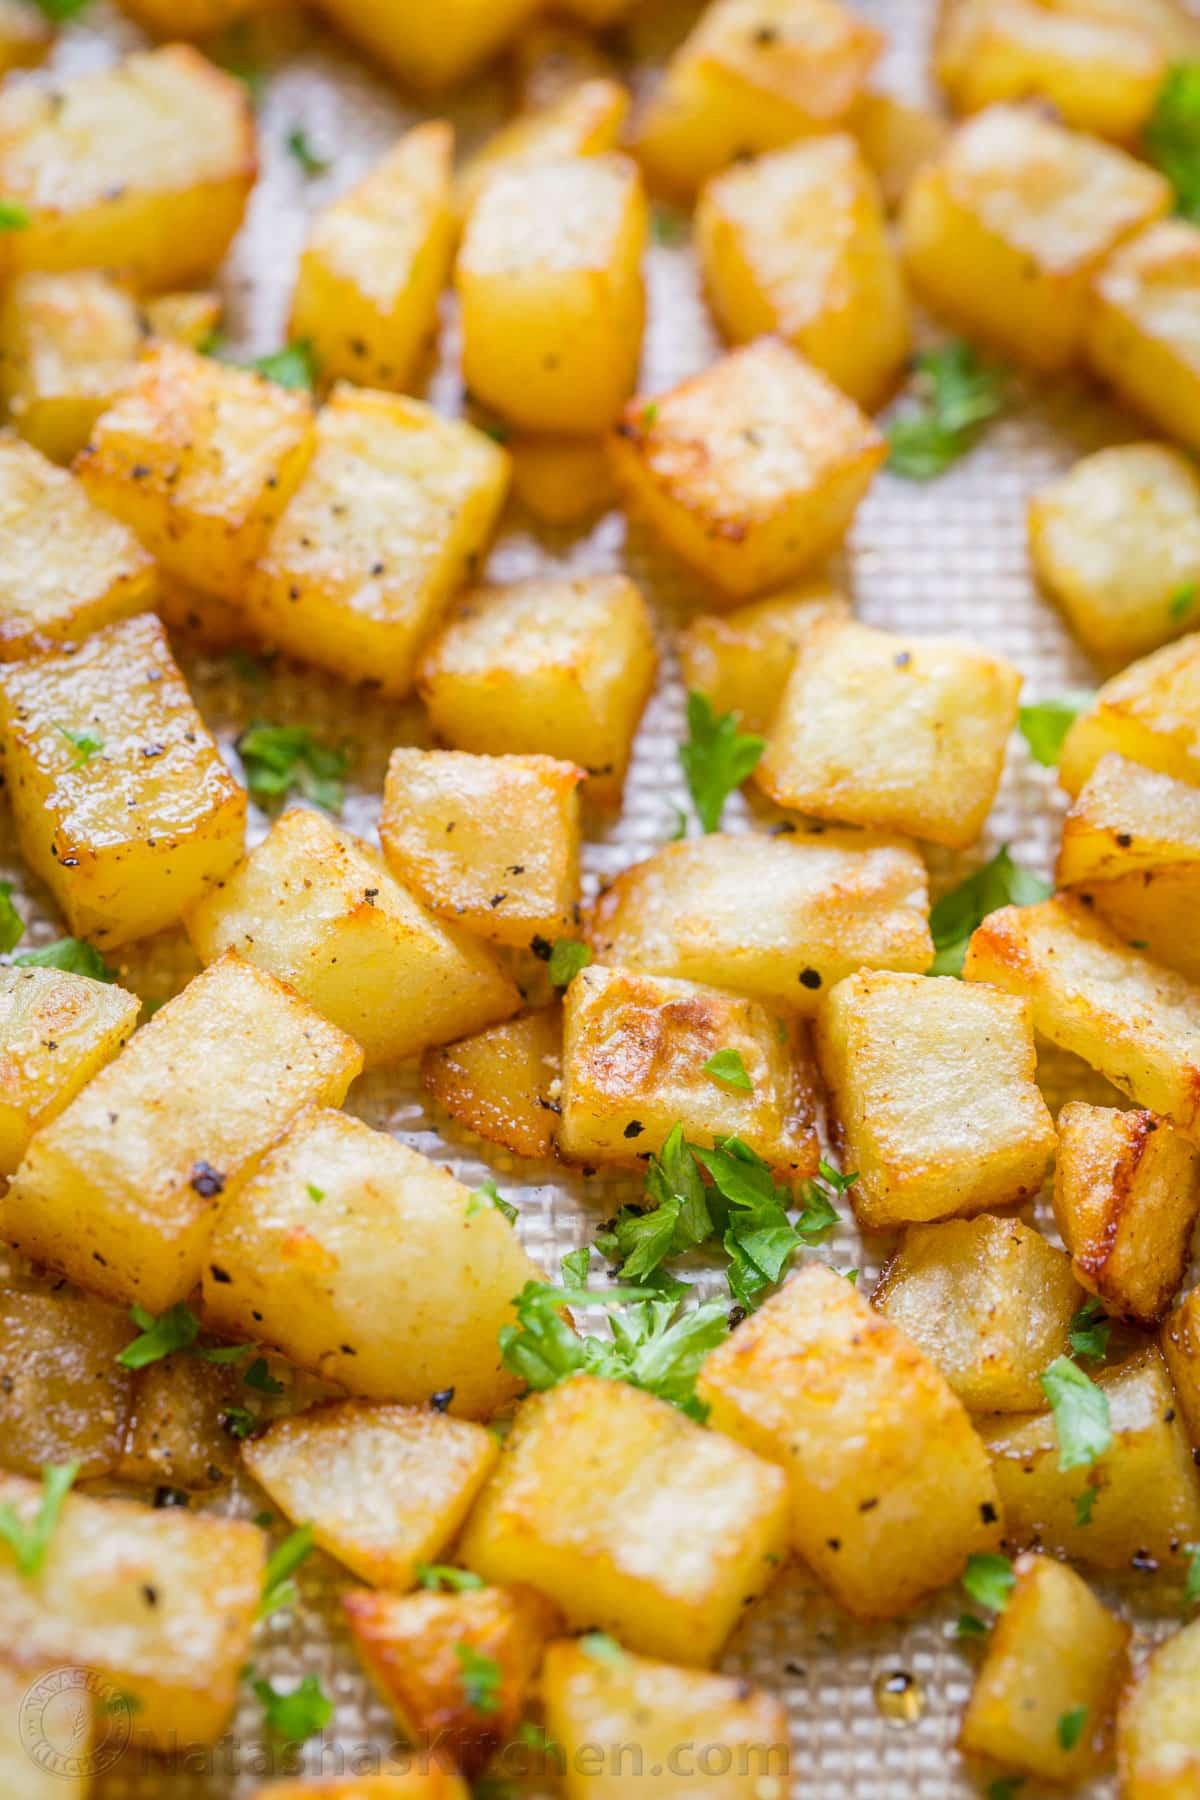 Potatoes Recipe For Breakfast  Breakfast Potatoes Recipe NatashasKitchen